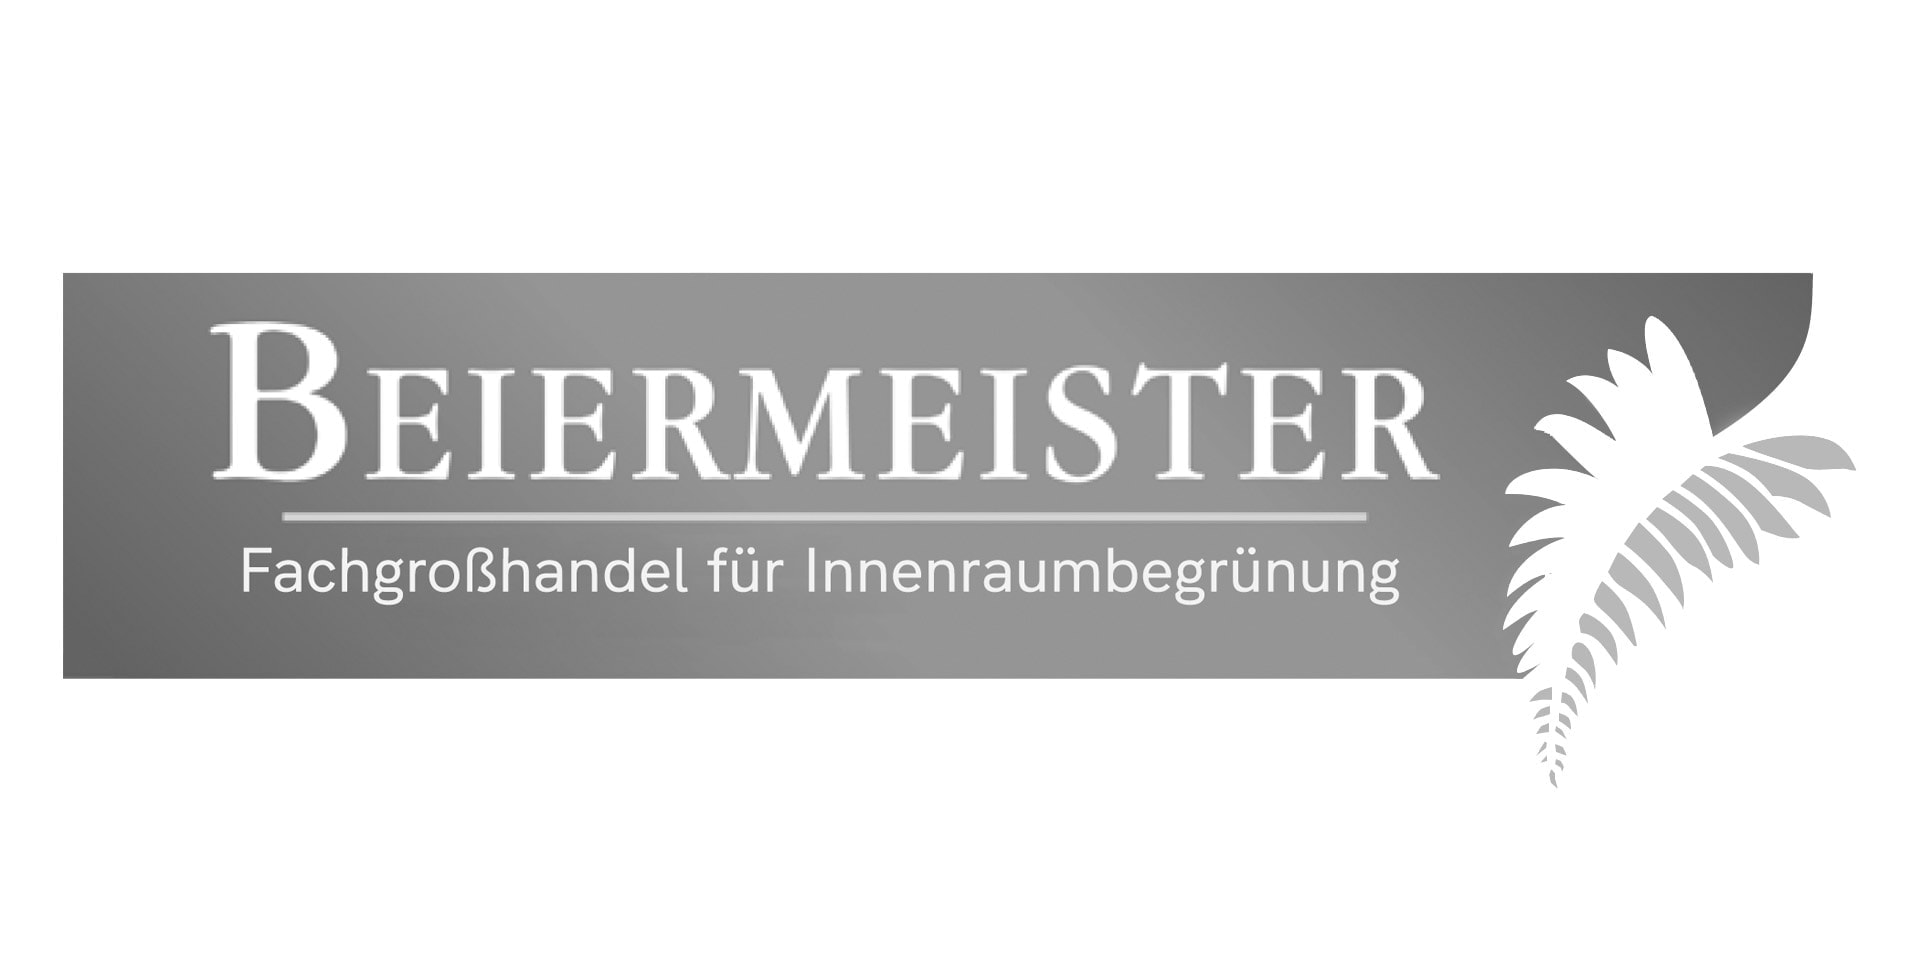 Beiermeister